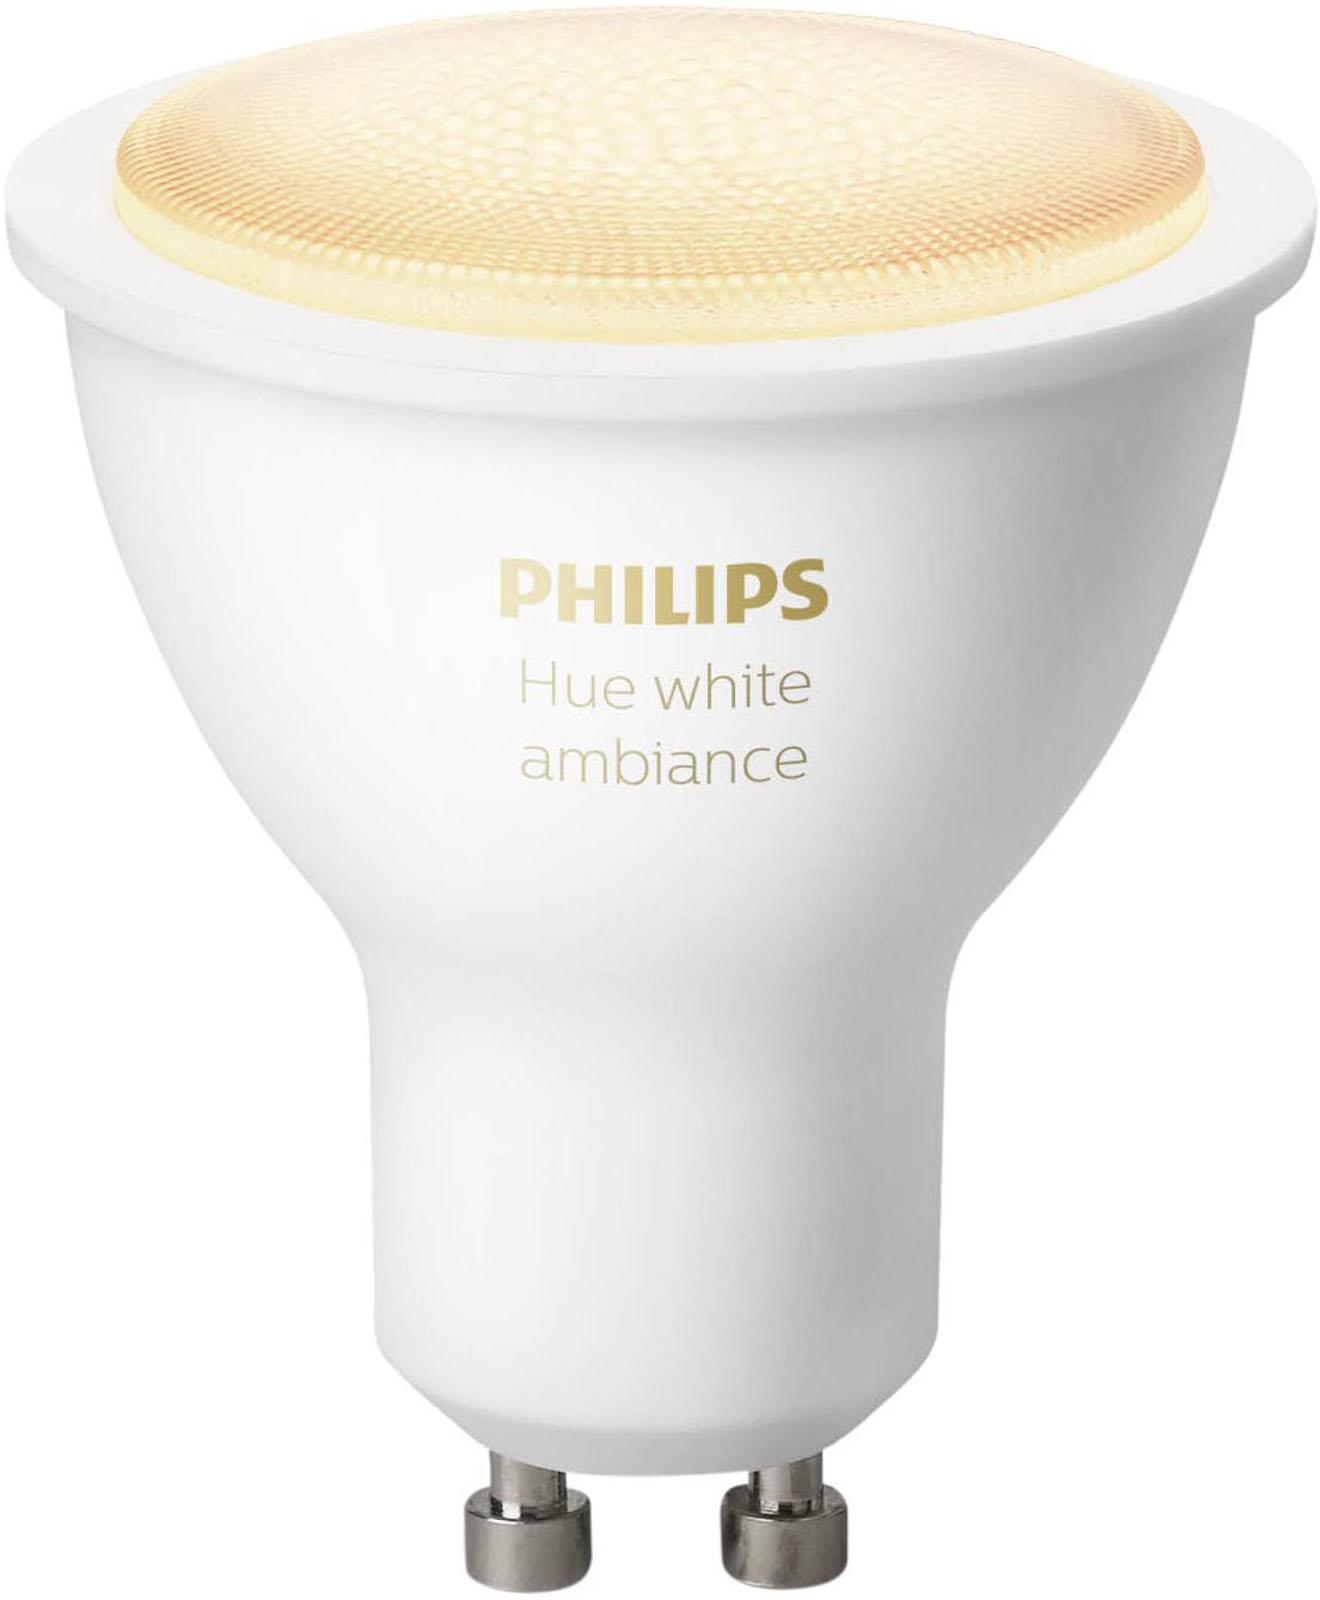 Philips Hue White Ambiance GU10 Bluetooth